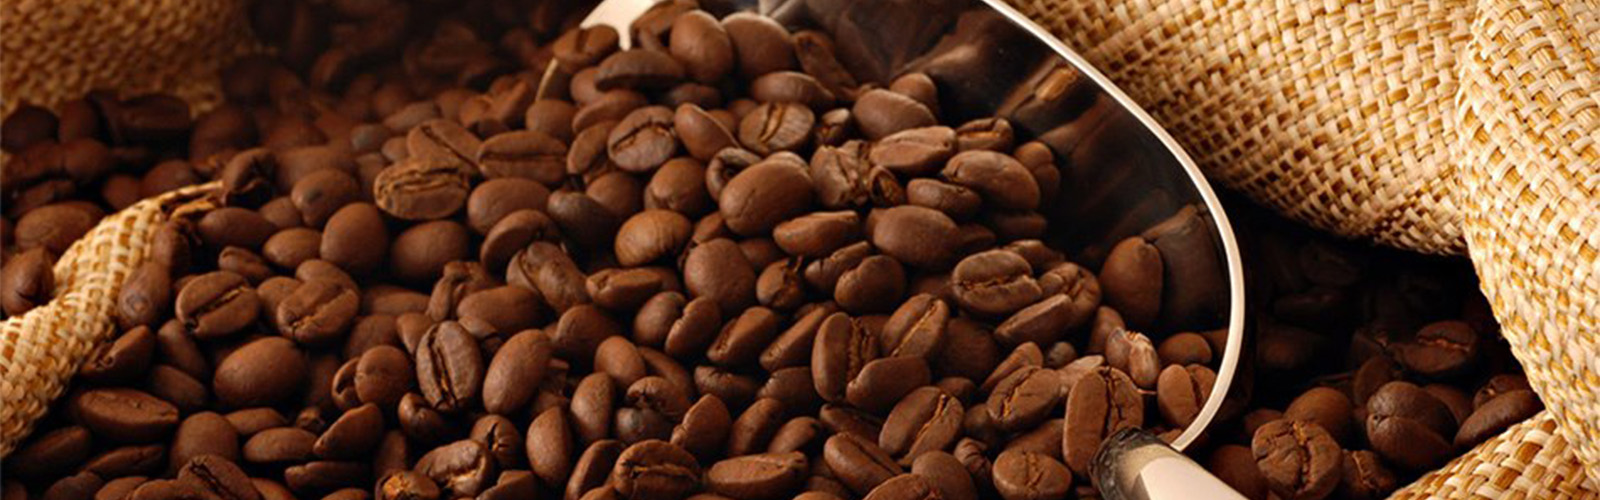 squirescoffeeslider-coffee-beans